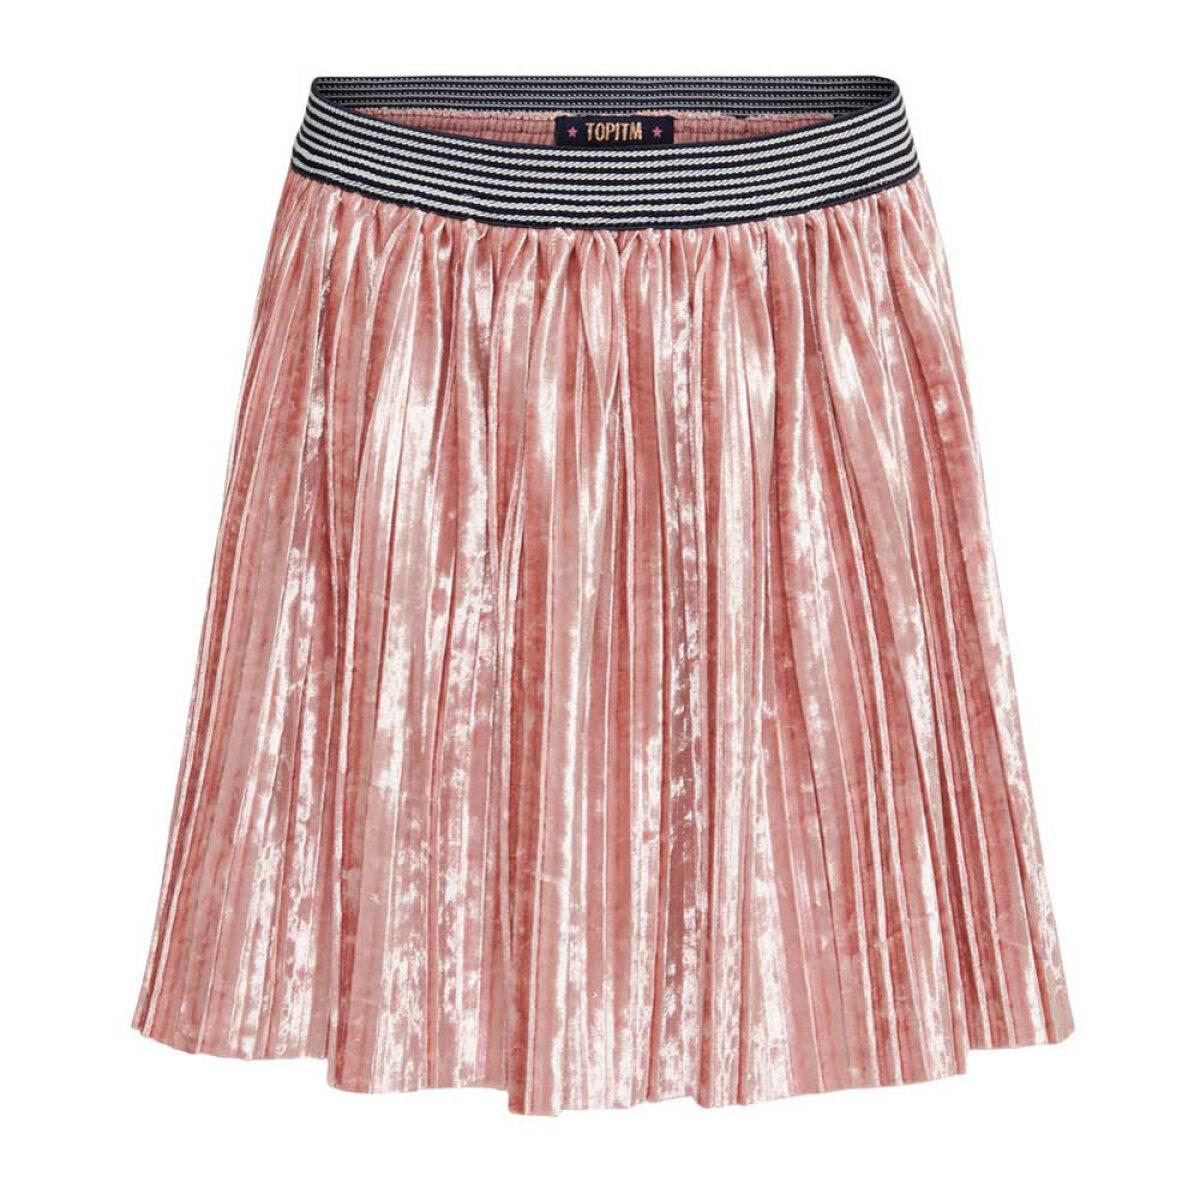 https://myshop.s3-external-3.amazonaws.com/shop3044400.pictures.topitm-rok-polly-velvet-pink.jpg